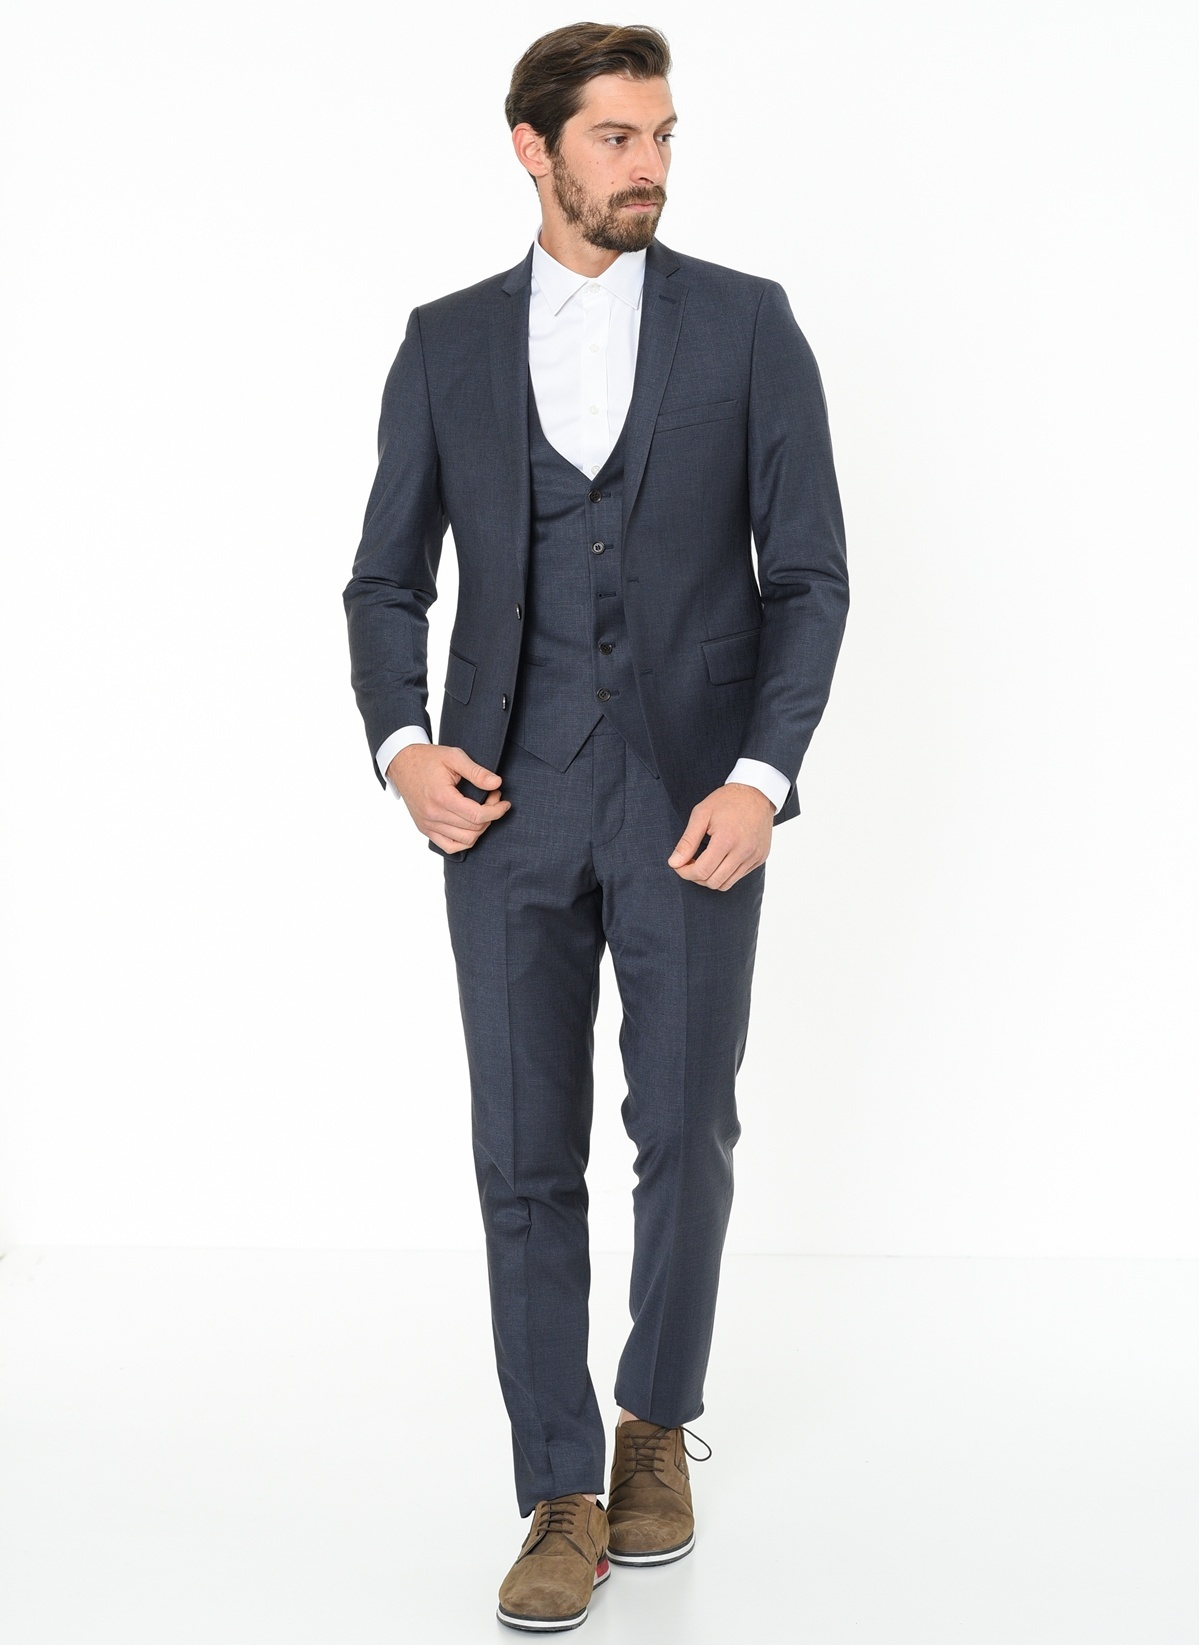 cd2f481b64035 Beymen Business Erkek Takım Elbise Lacivert   Morhipo   21327975